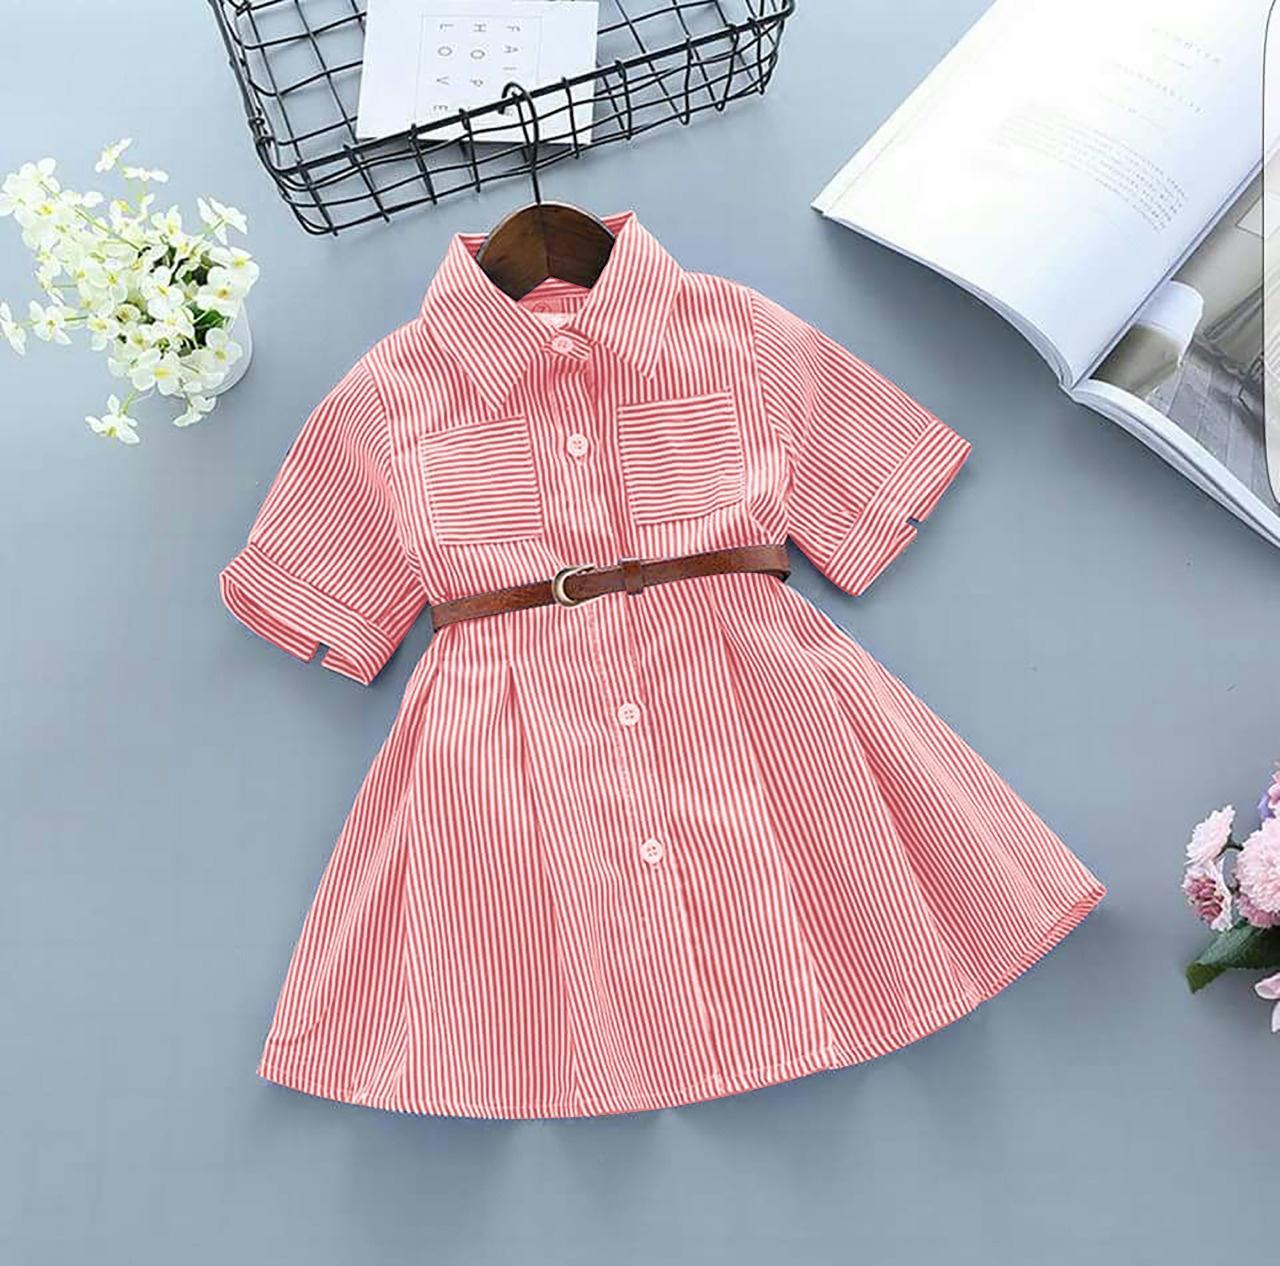 HRV Shop Dress Anak Cewek Catty Salur   Dress Anak Perempuan   Baju Terusan  Anak Perempuan 3b0b93cc8a